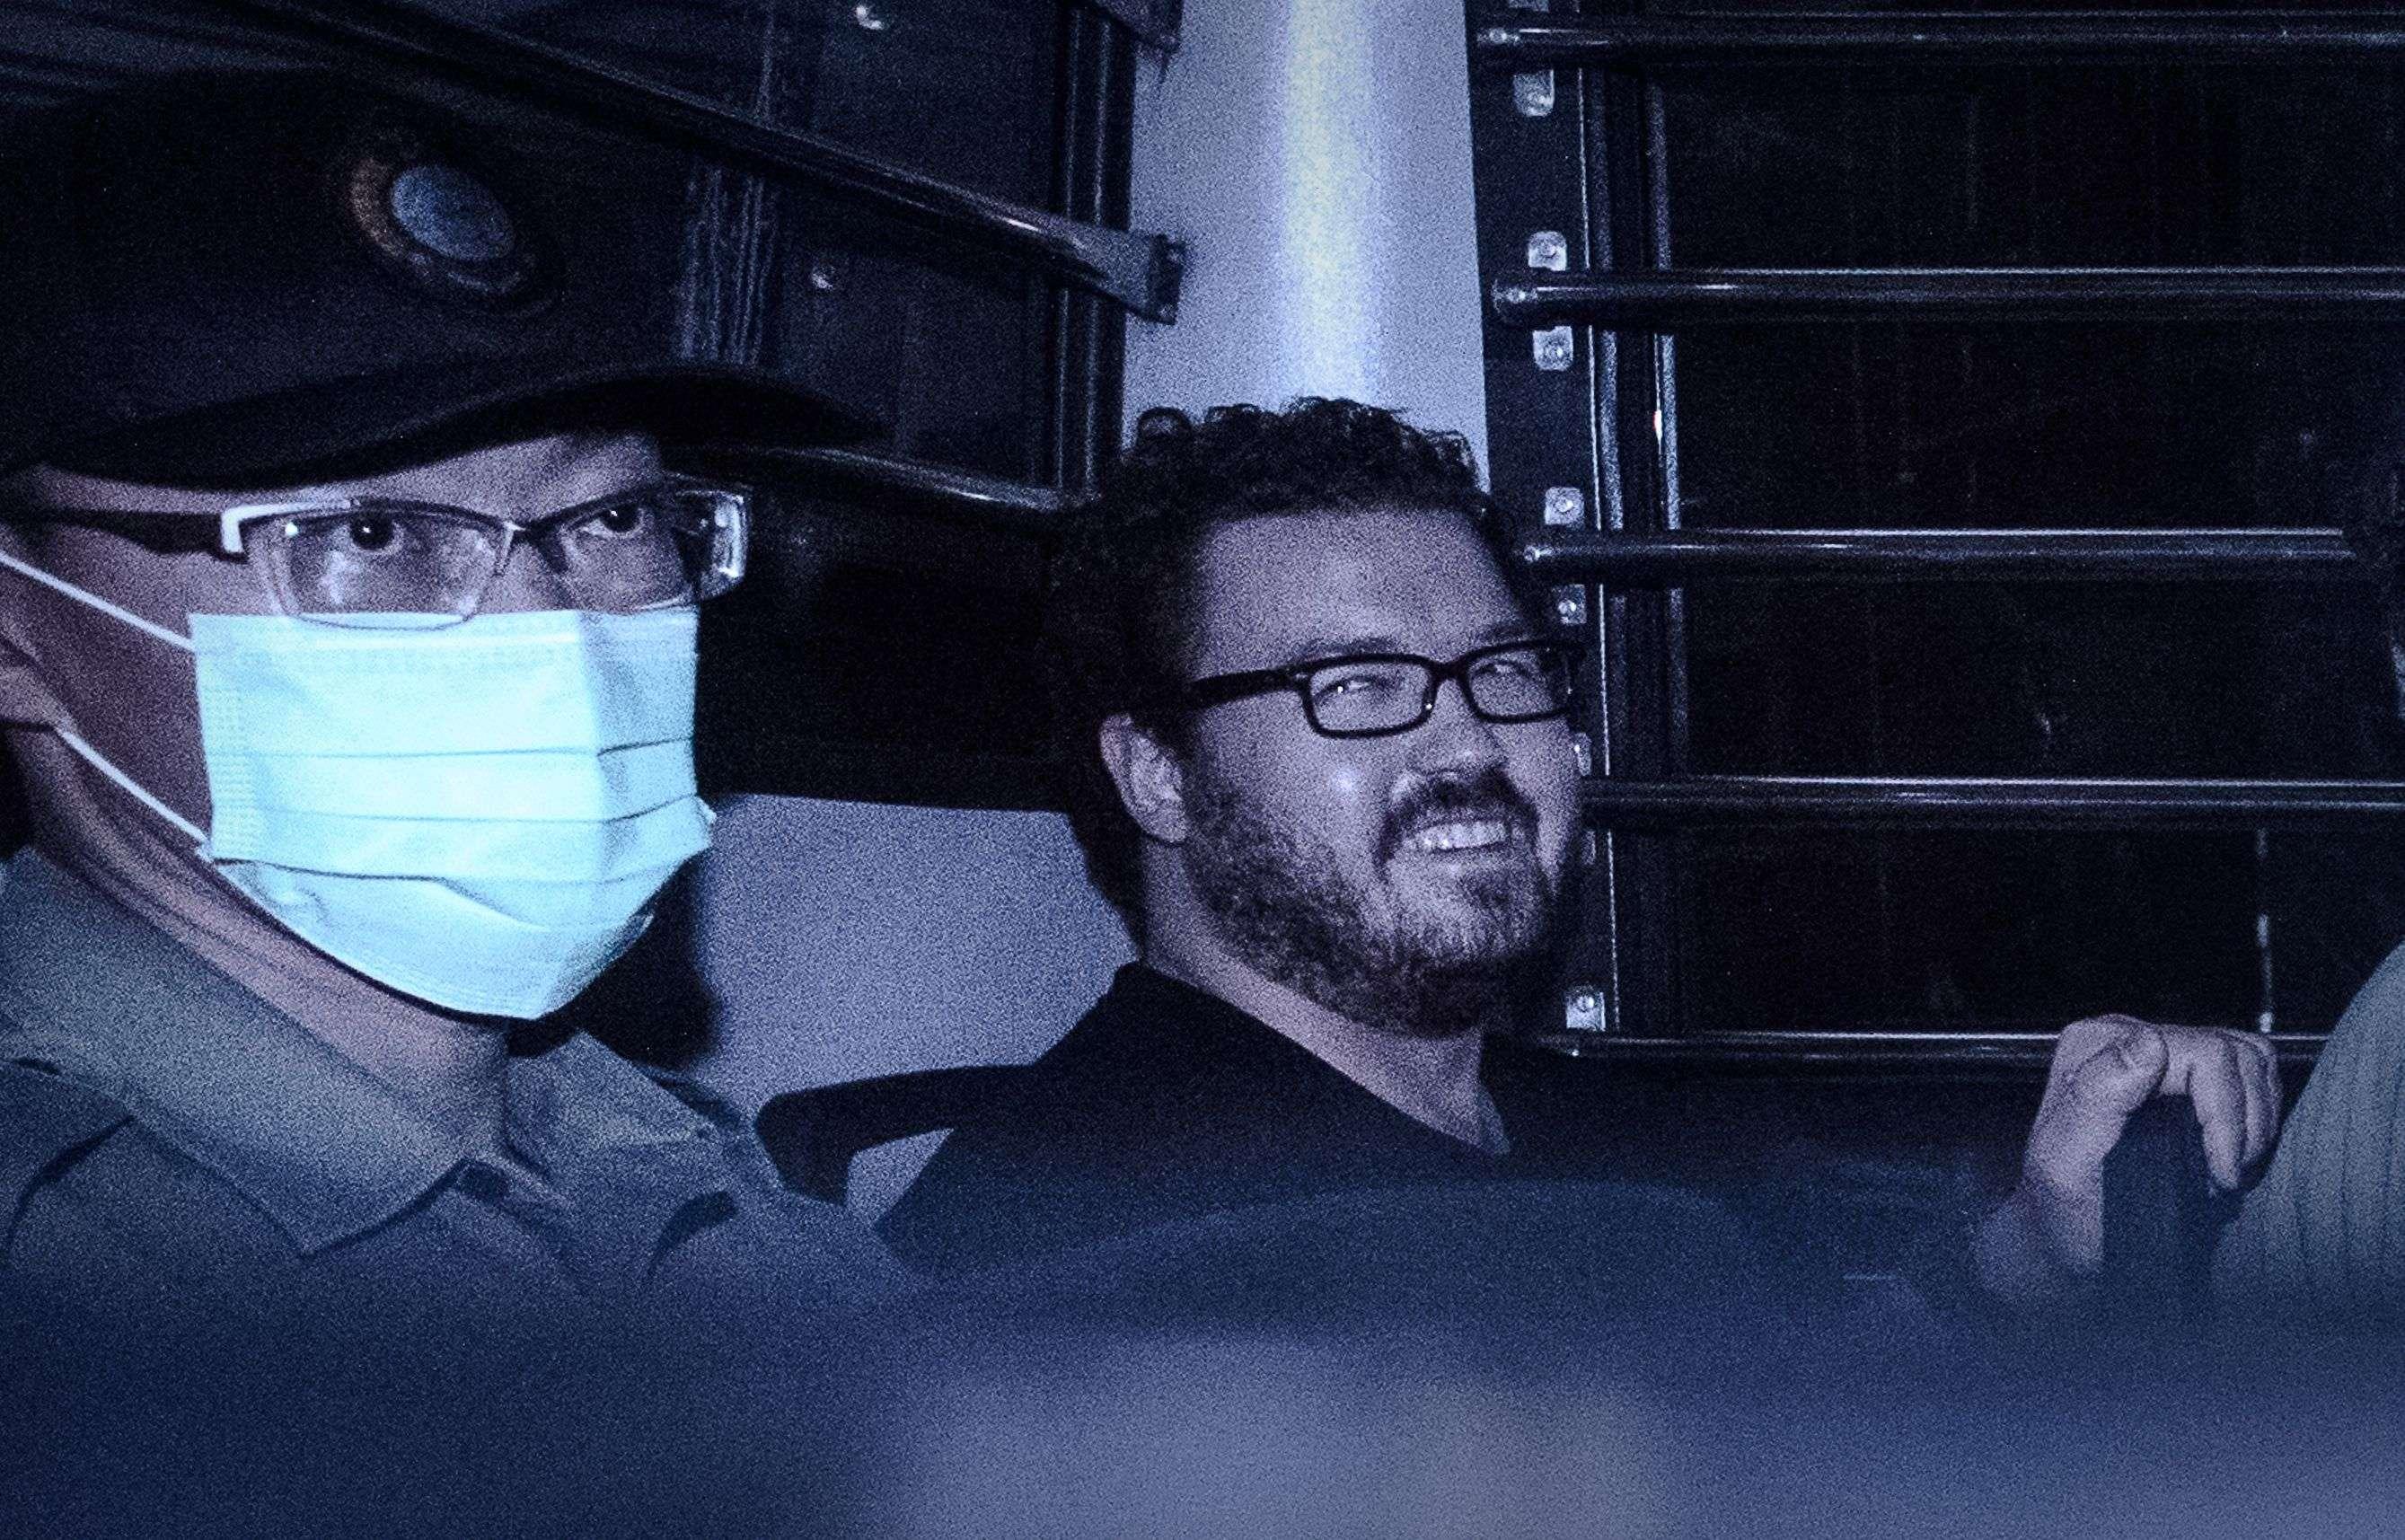 Double murderer Rurik Jutting set for Hong Kong appeal court